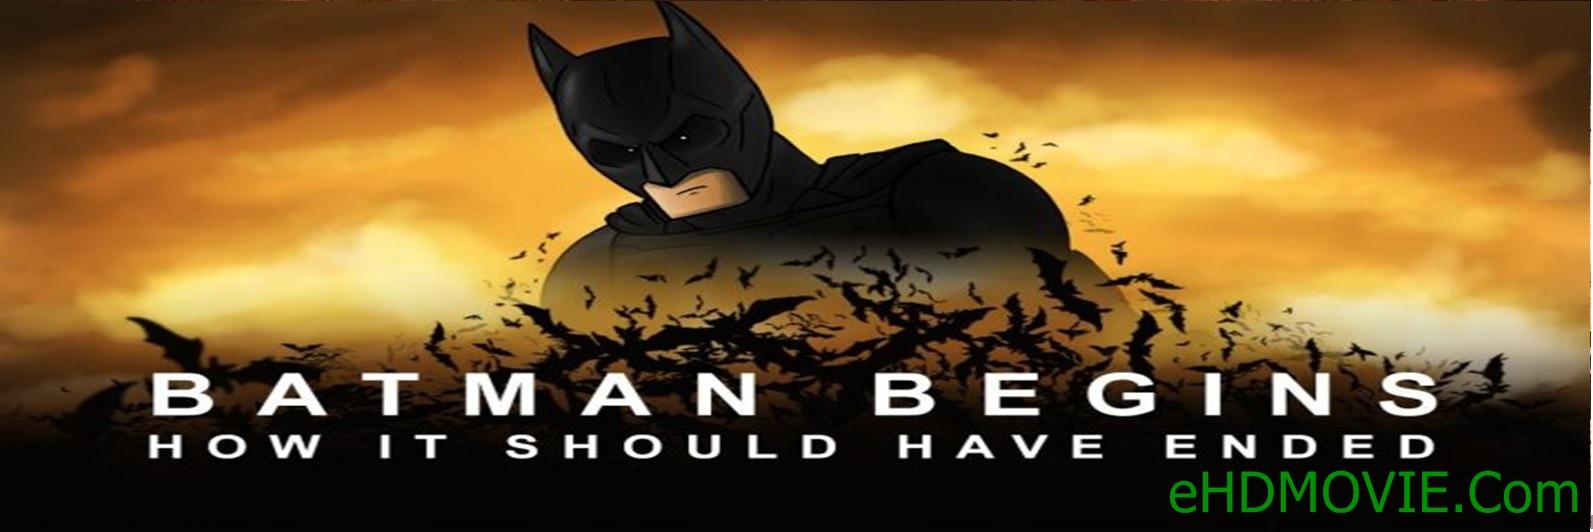 Batman Begins 2005 Full Movie Dual Audio [Hindi – English] 1080p - 720p - 480p ORG BRRip 400MB - 1GB - 3GB ESubs Free Download